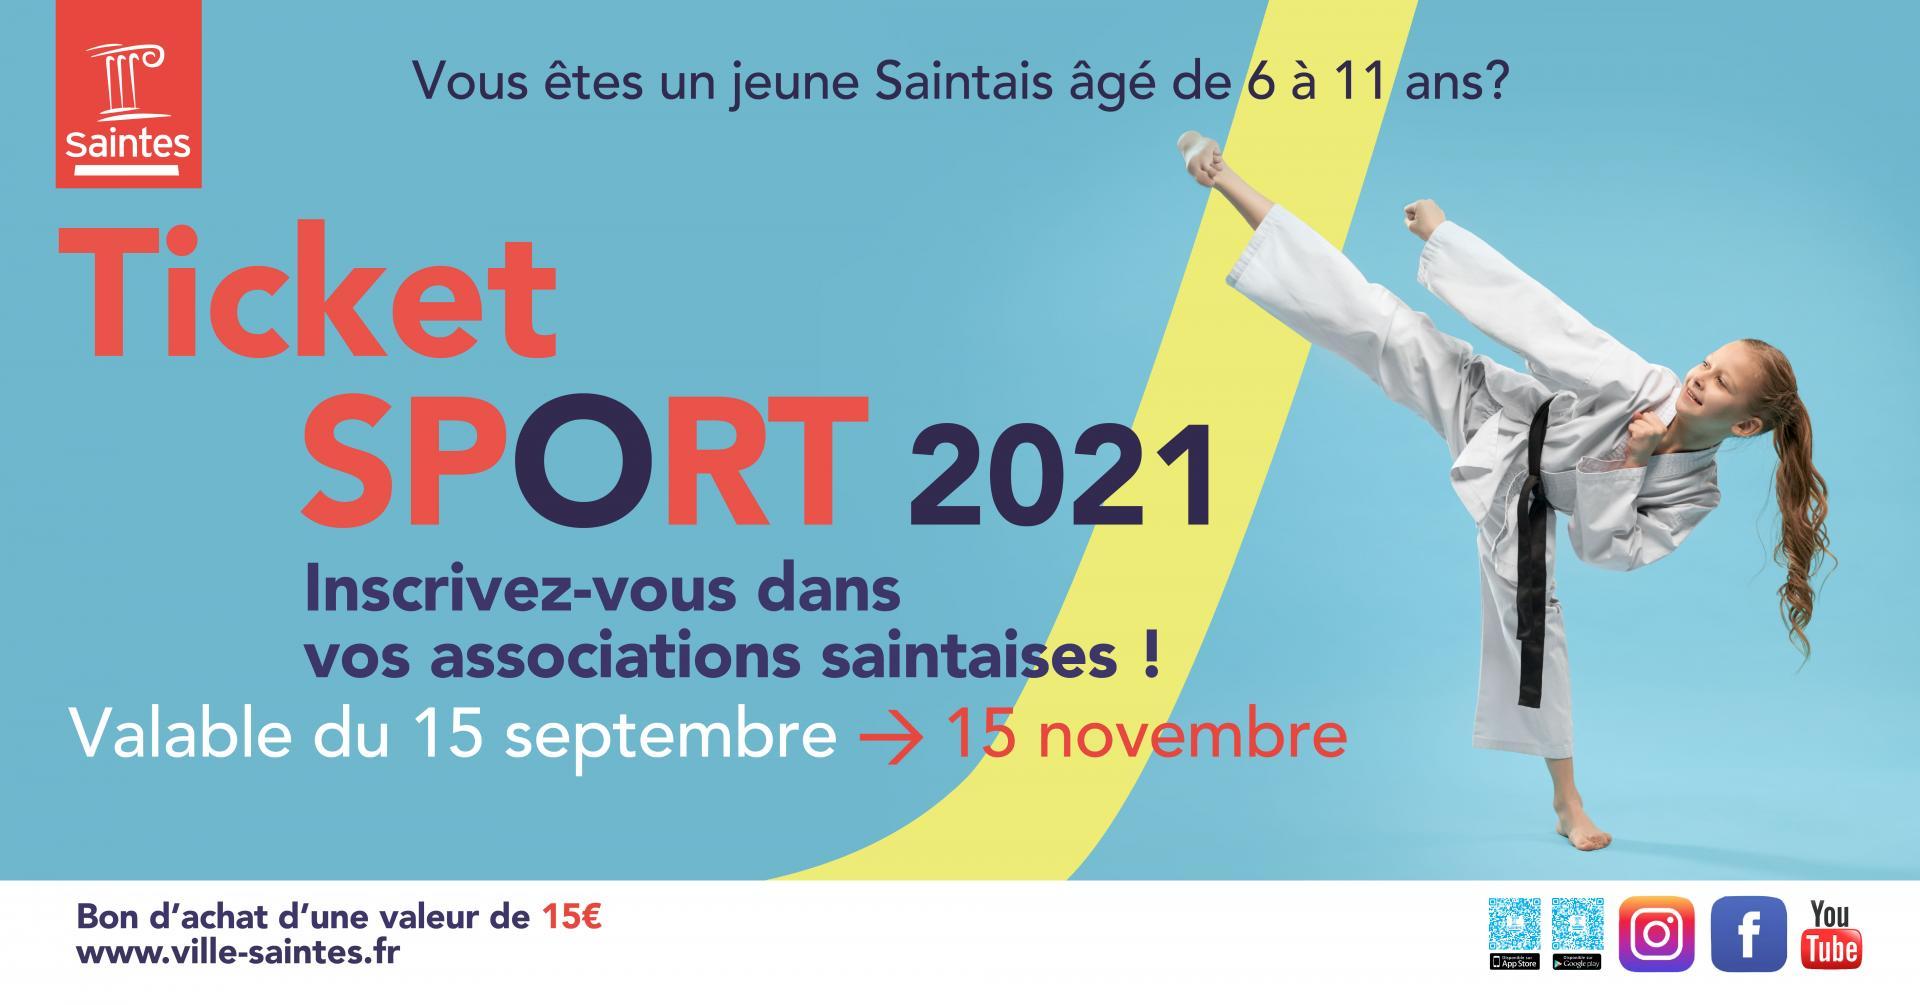 Ticket sport 2021